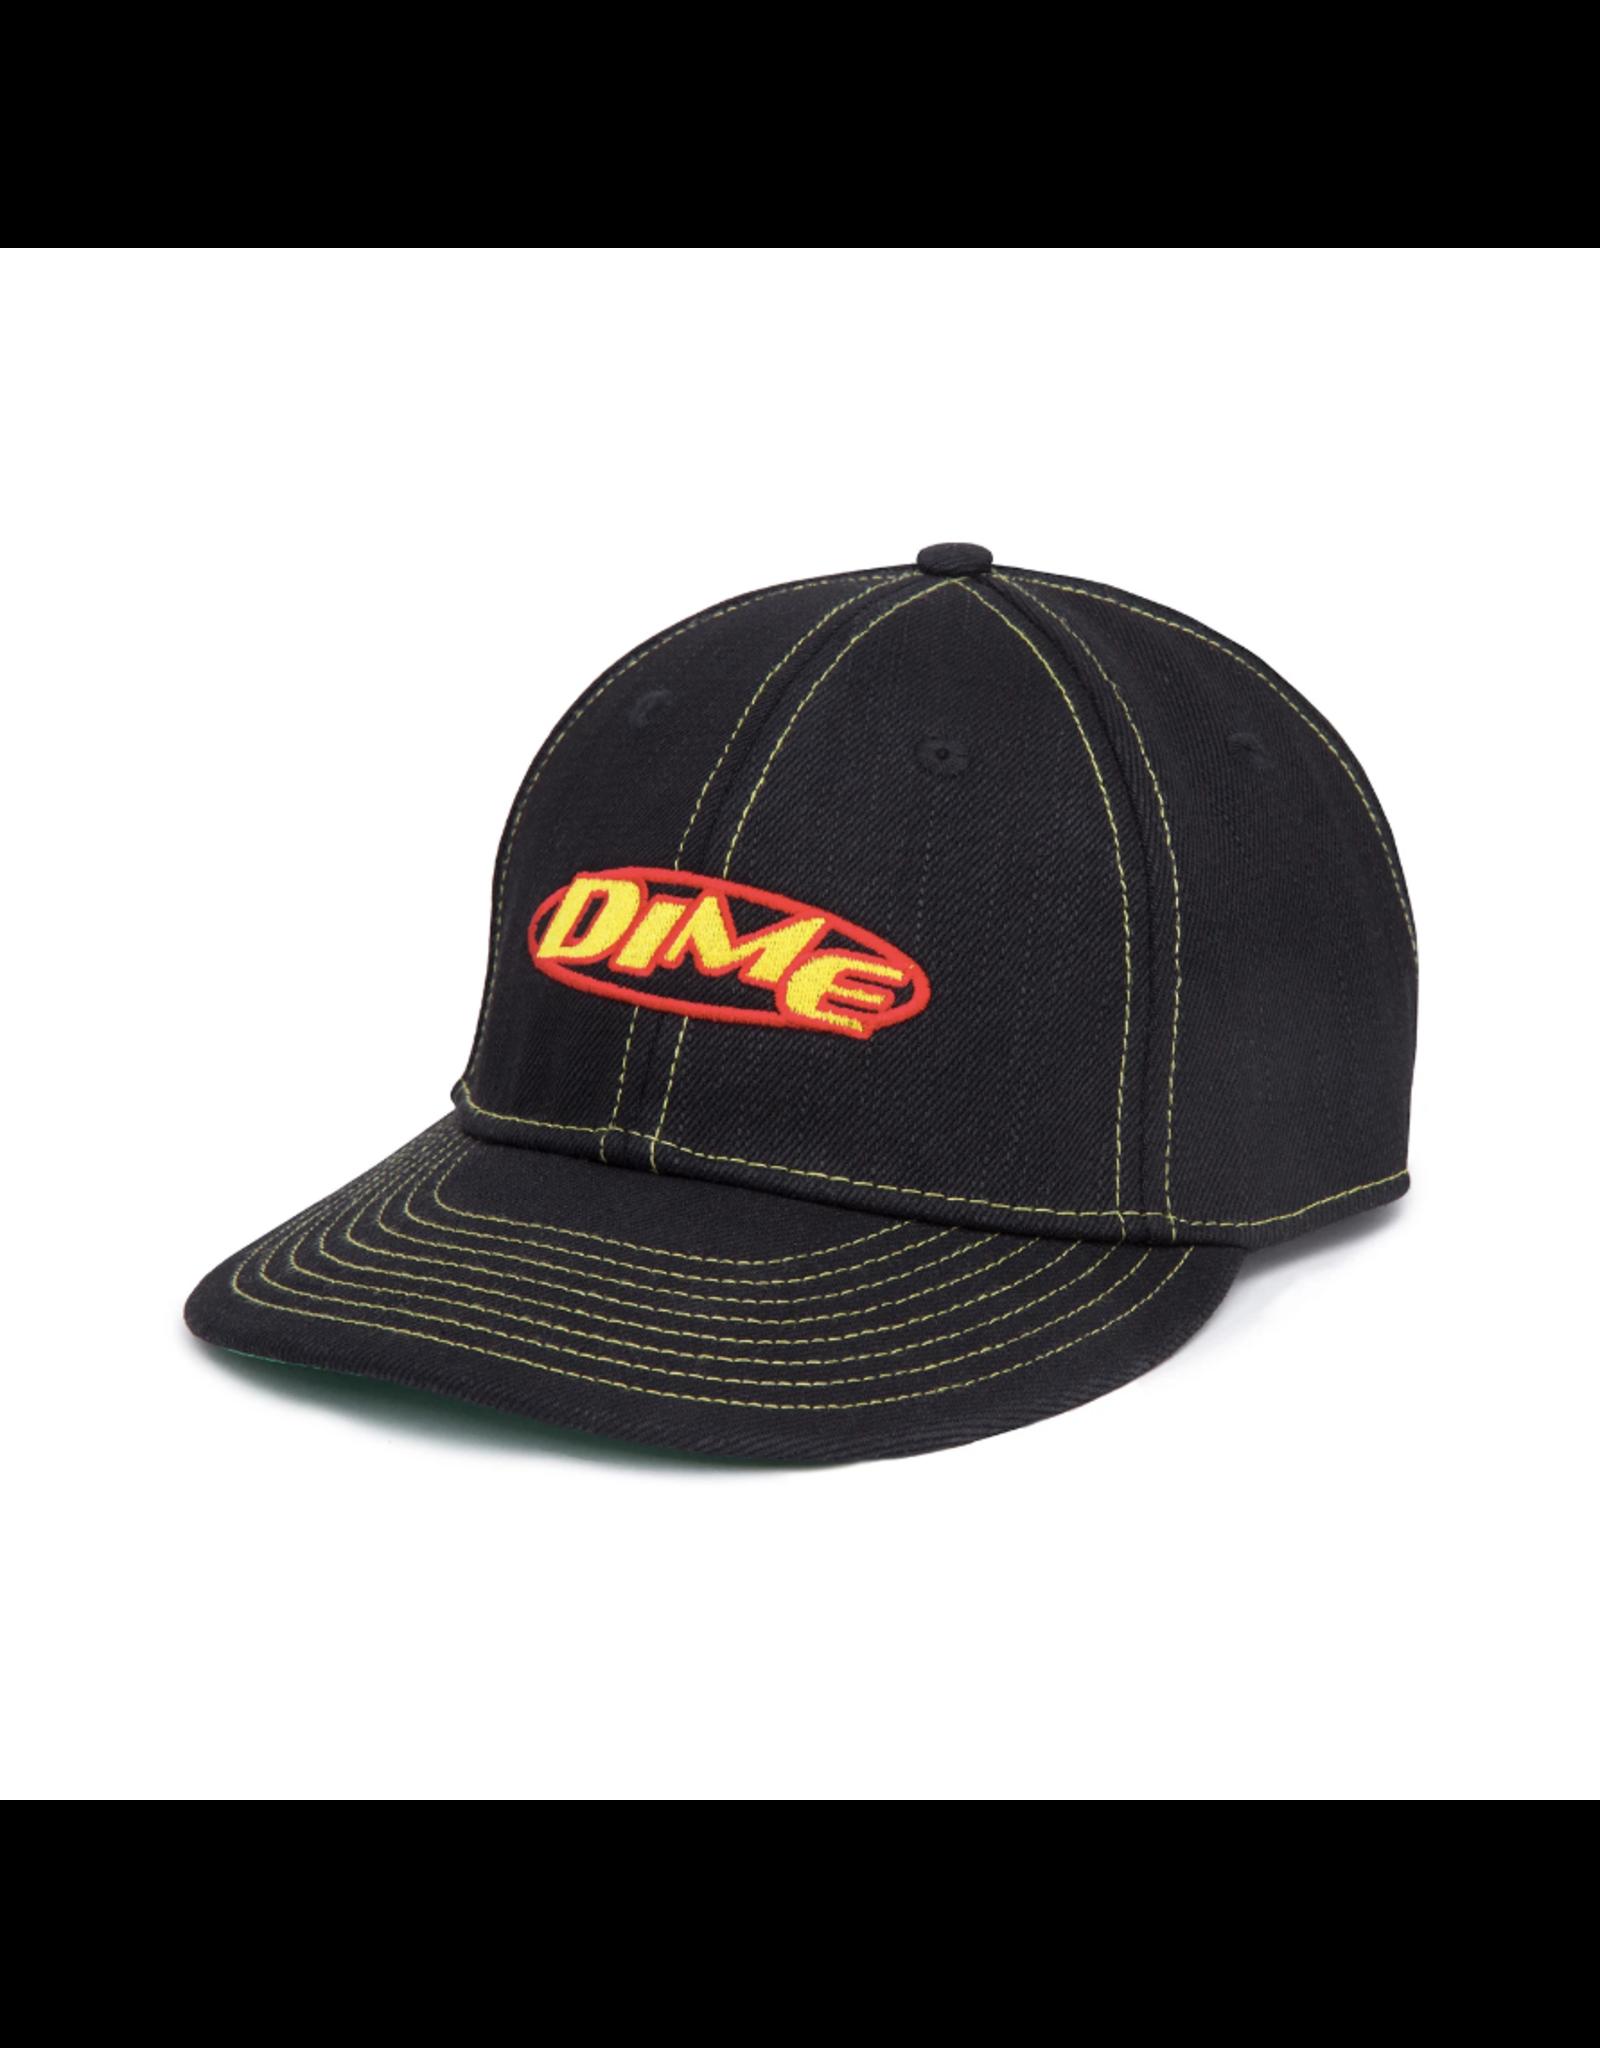 Dime Contrast Denim Hat - Black